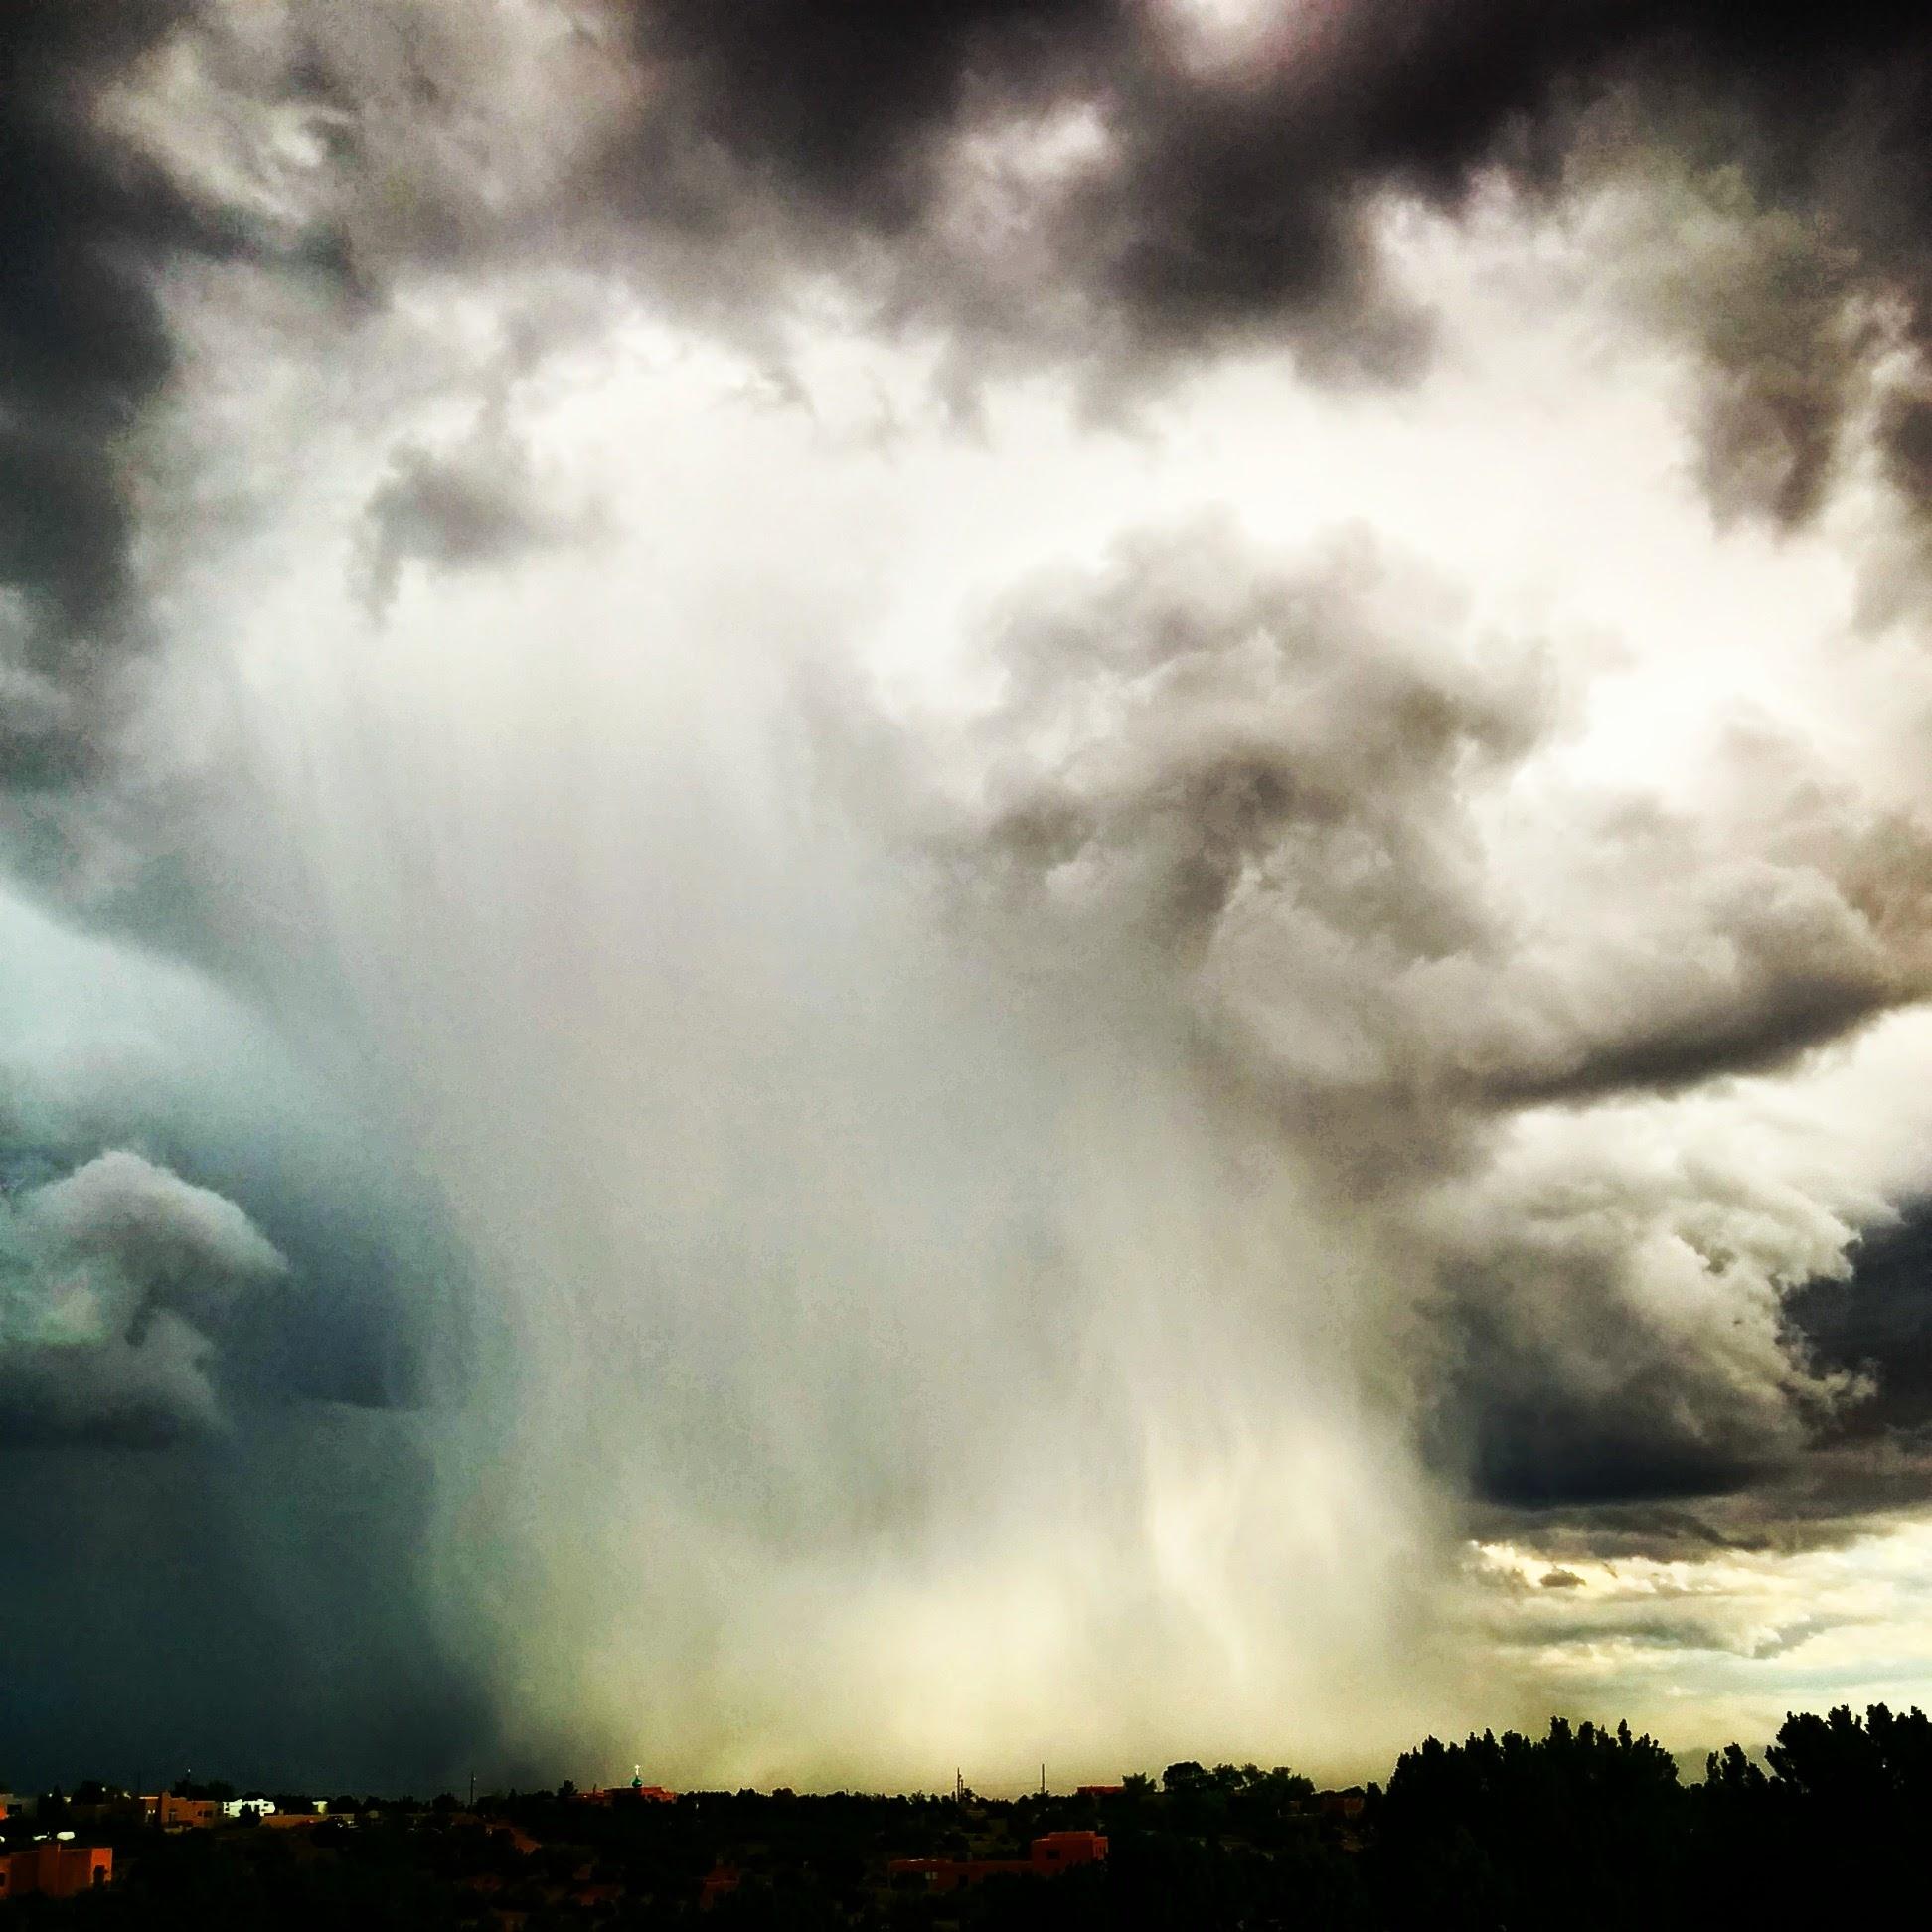 A storm near Santa Fe